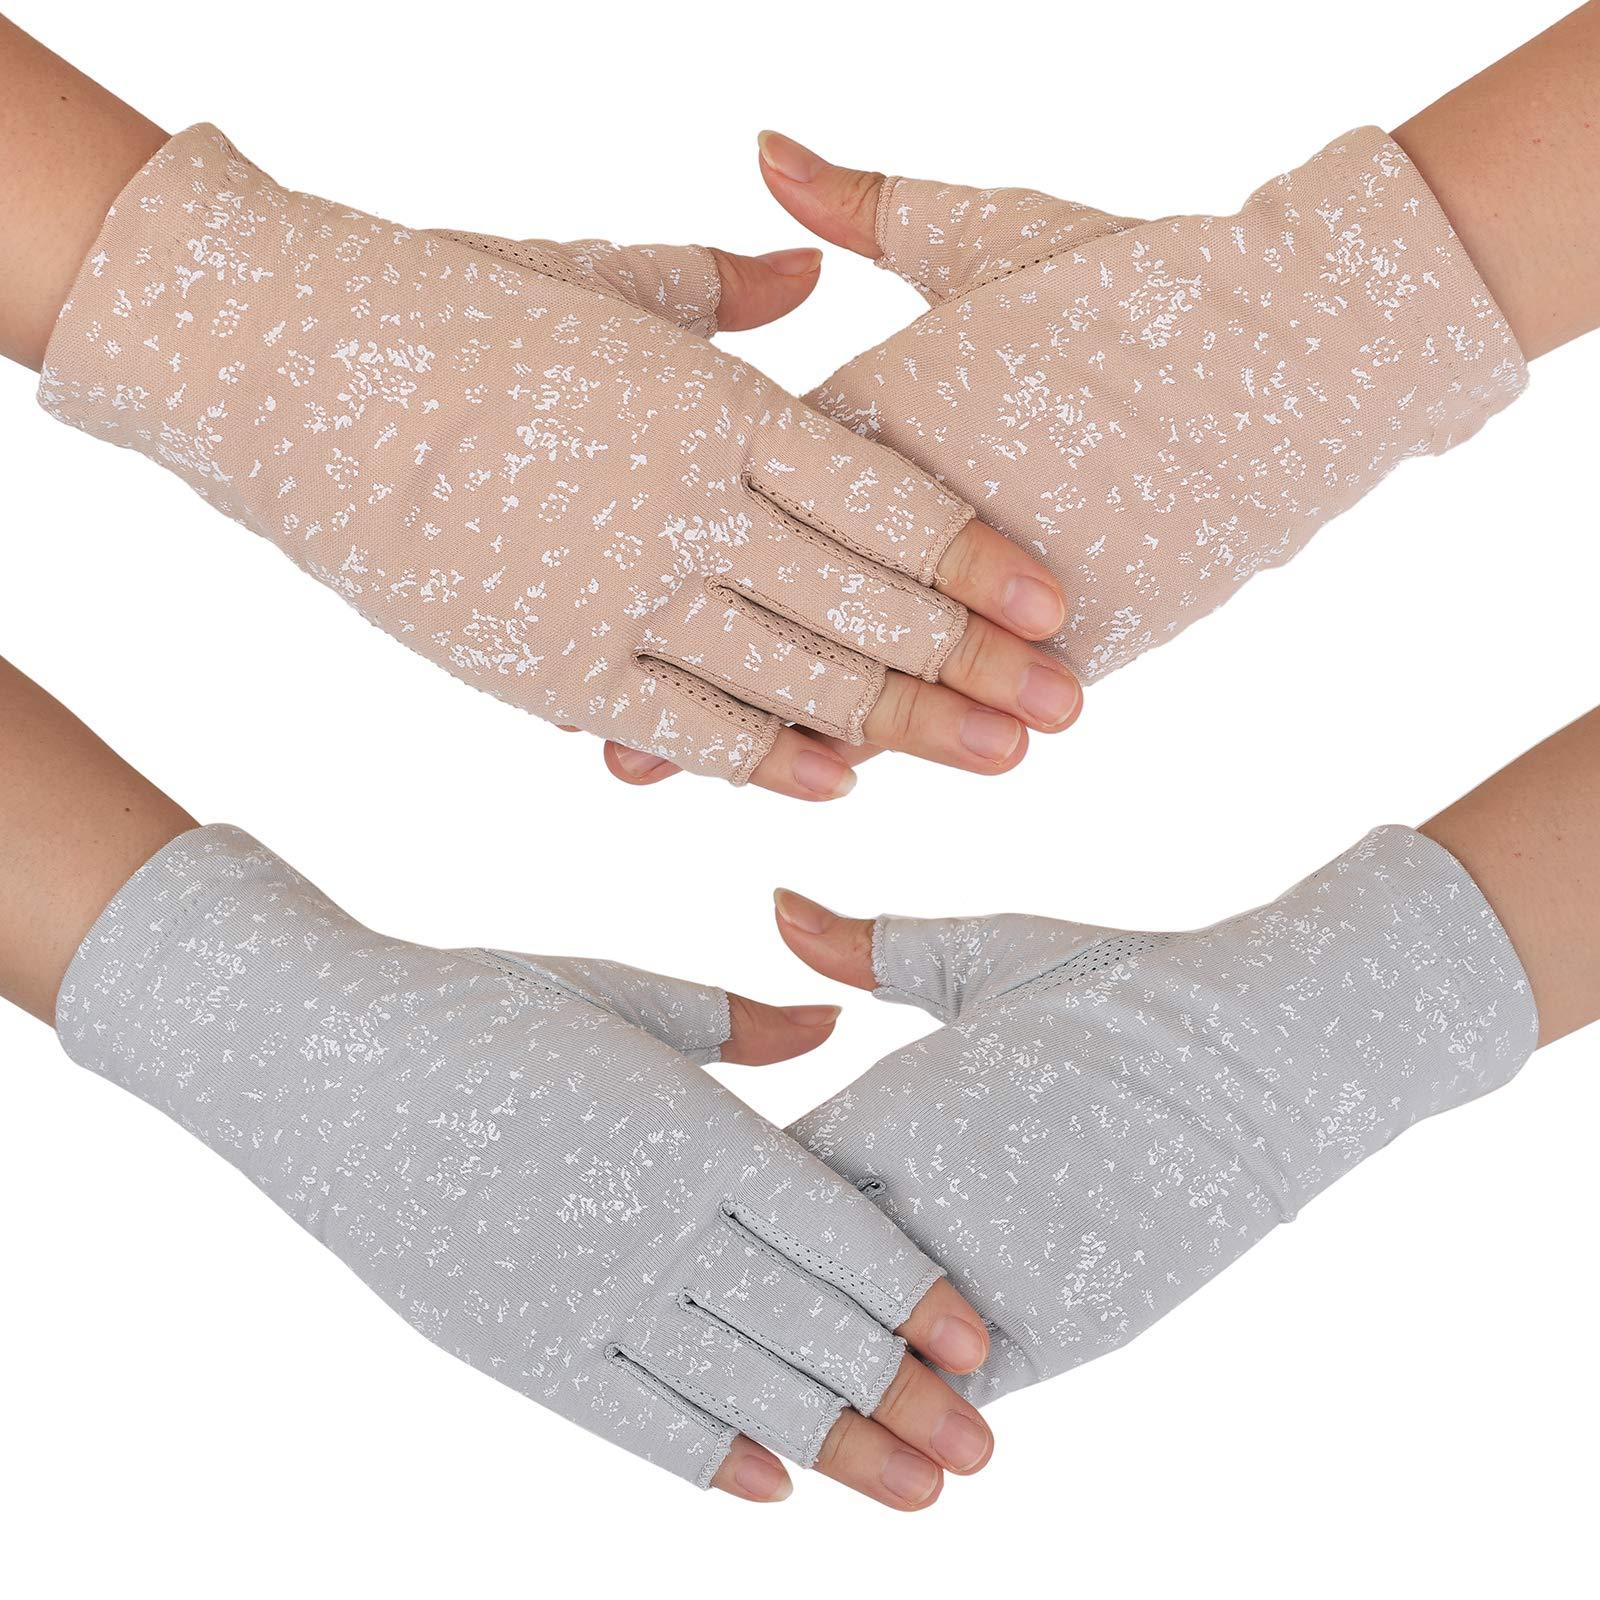 Flammi Women's UV Protection Fingerless Sun Driving Gloves Cotton Non Skid Palm (Khaki, Grey)